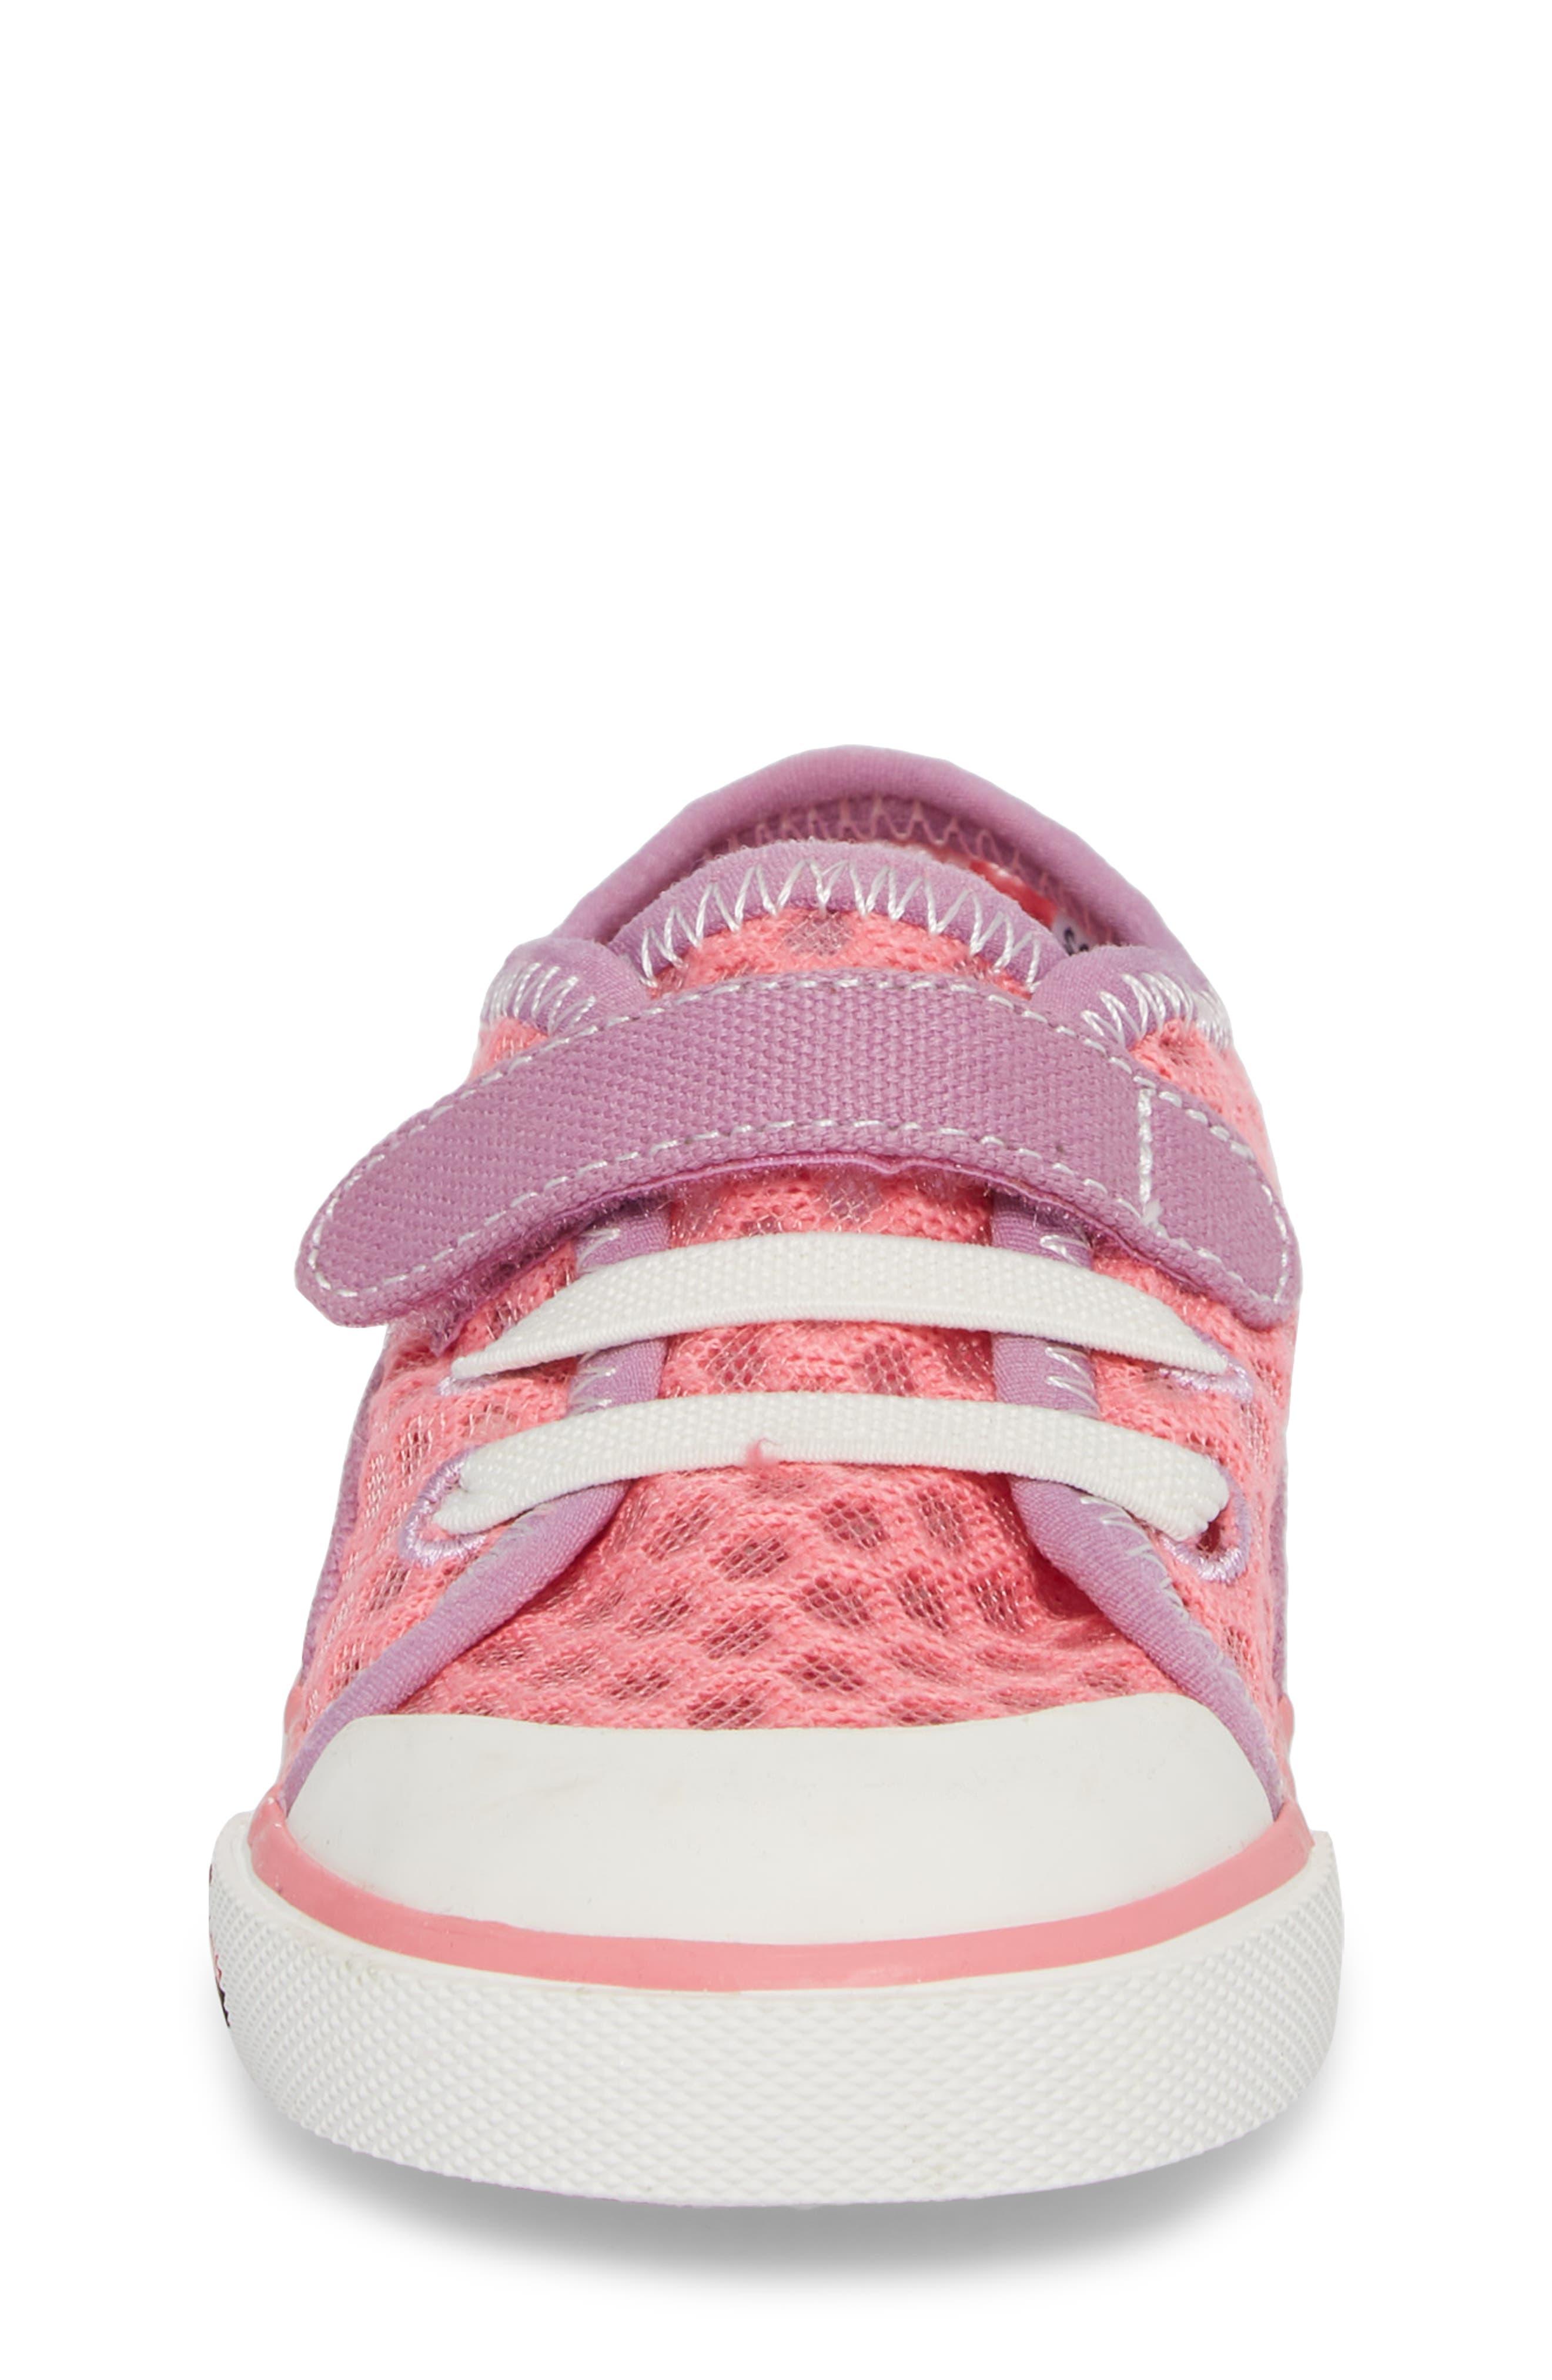 Saylor Sneaker,                             Alternate thumbnail 4, color,                             Hot Pink